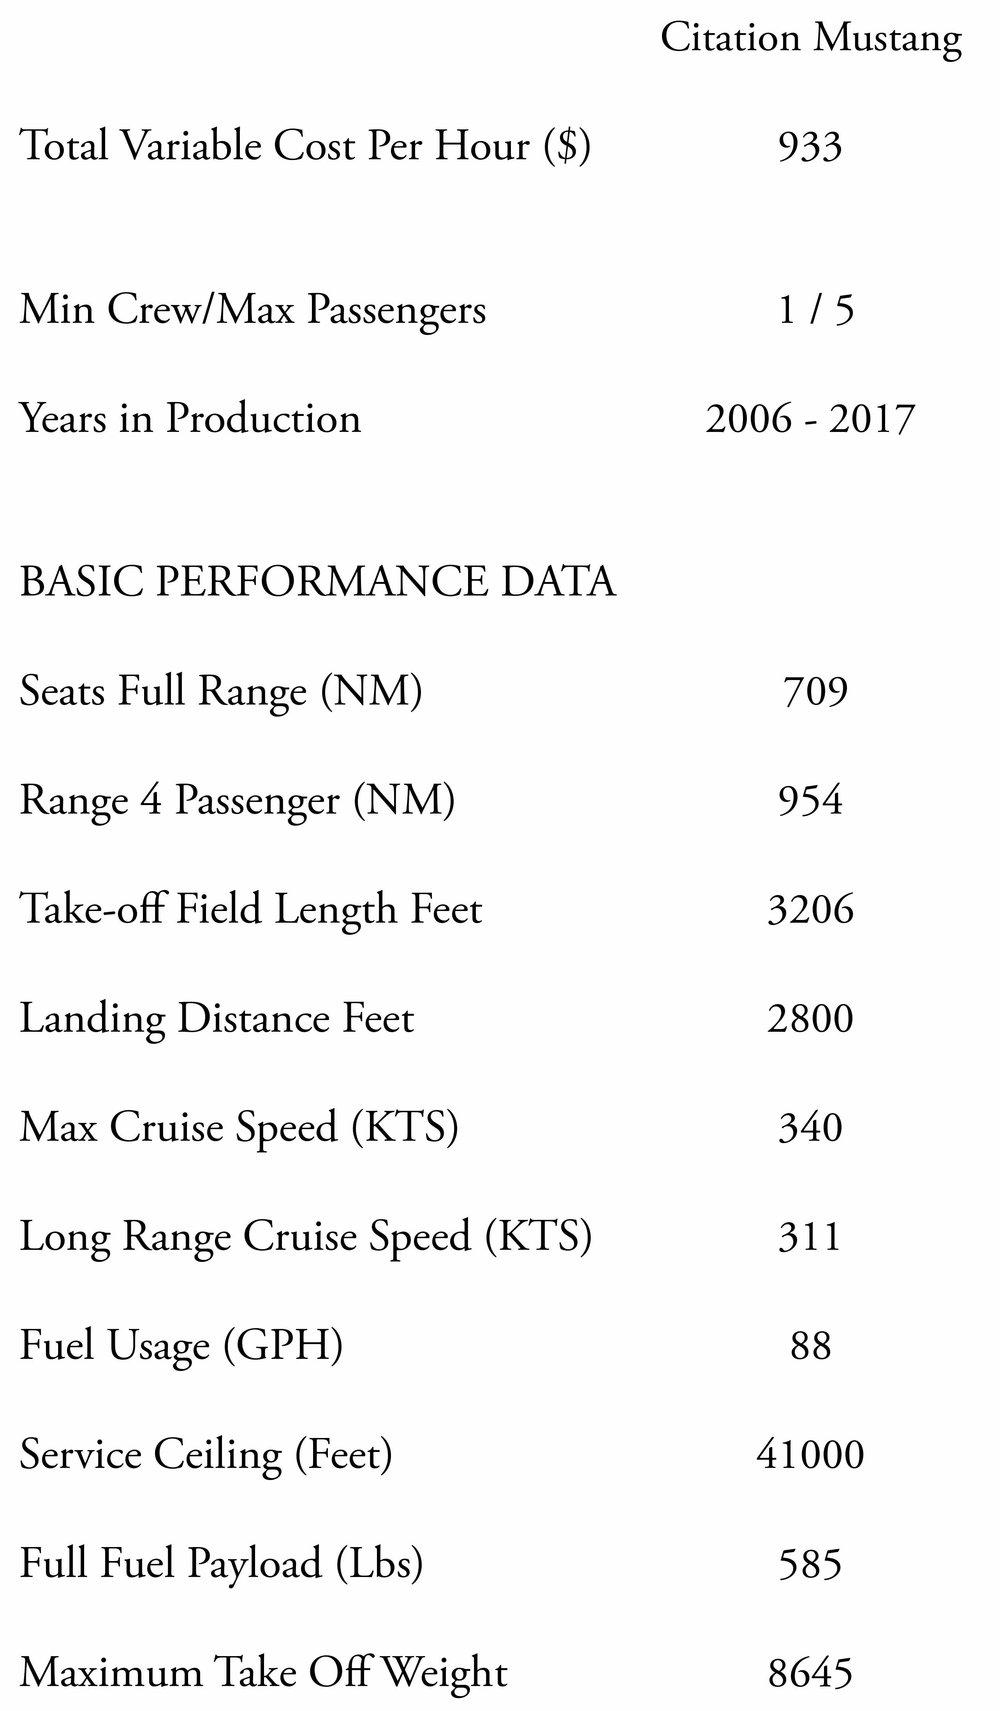 Citation Mustang jet specs, information, ownership costs, variable costs, crew/passenger ration, flight range distance.